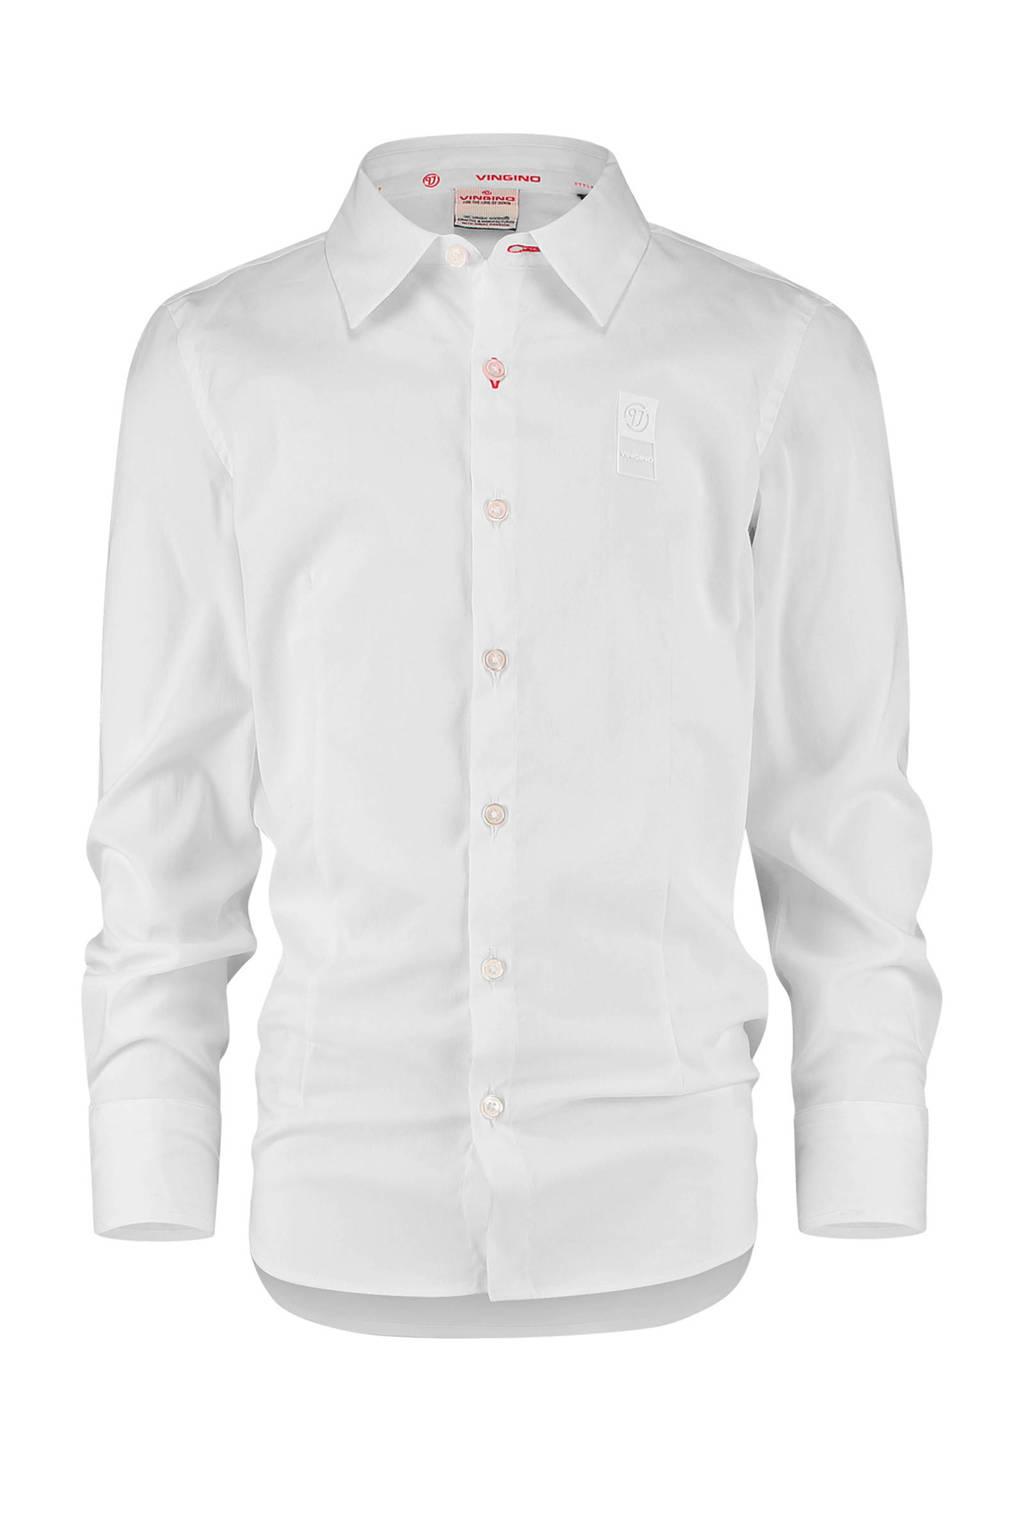 Vingino Essentials overhemd wit, Wit